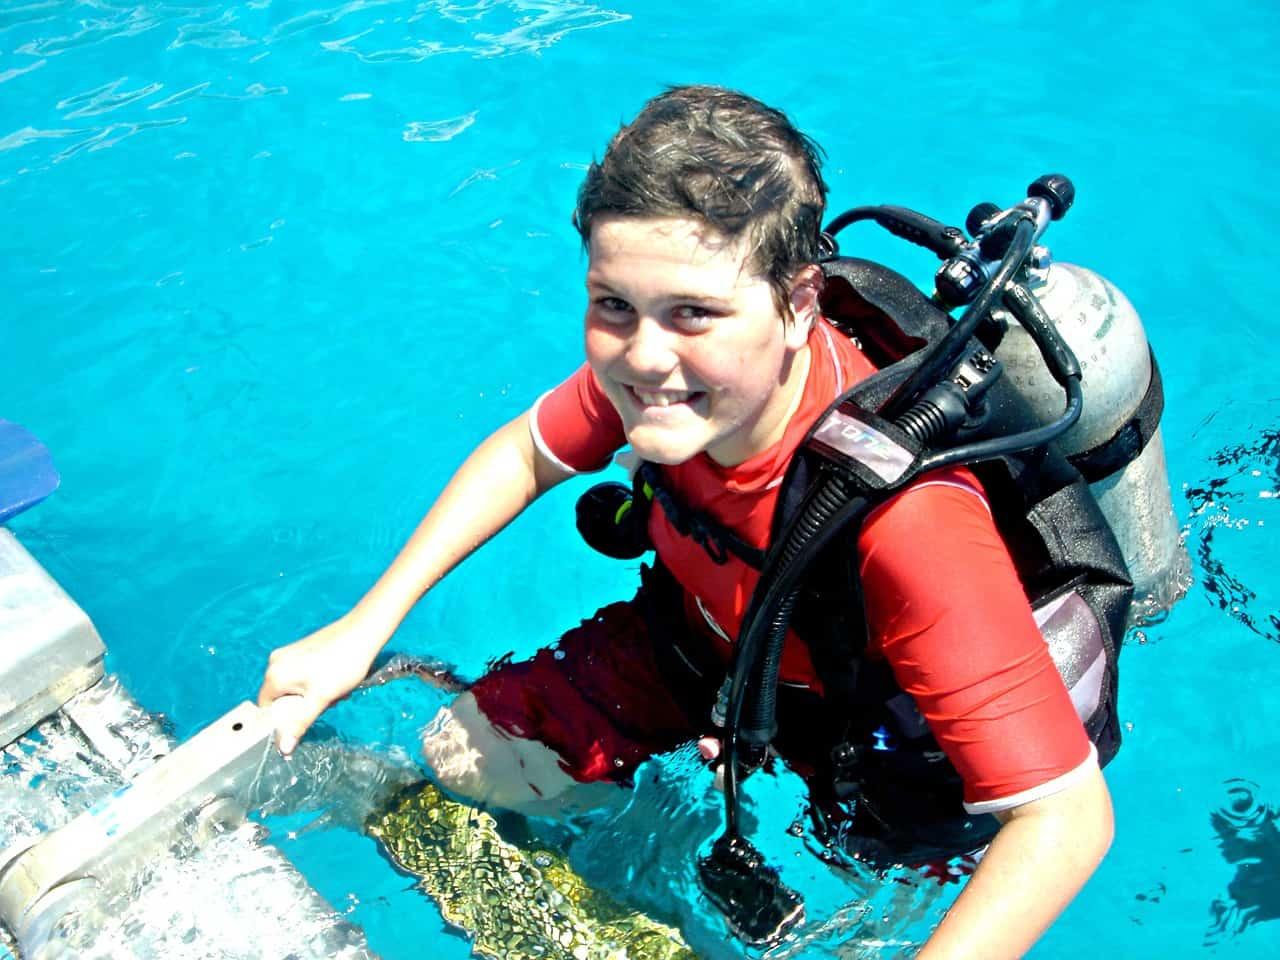 Scuba Diving Gear For Kids